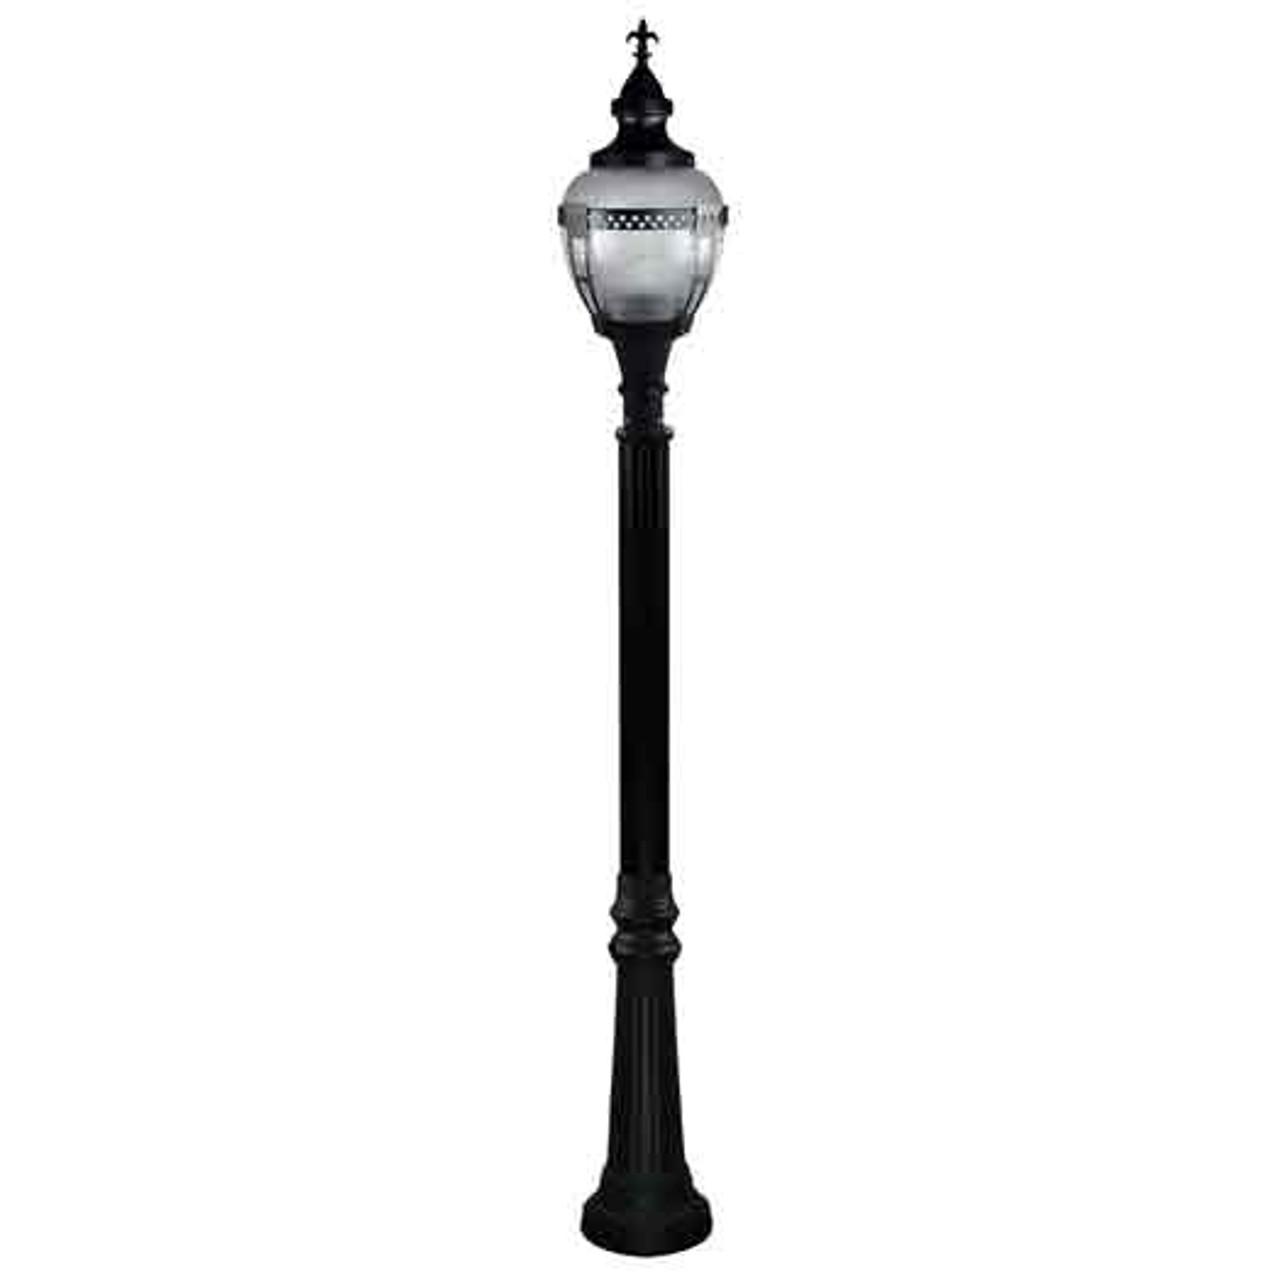 Bostonian Historic Premium Post Top Light on Pole